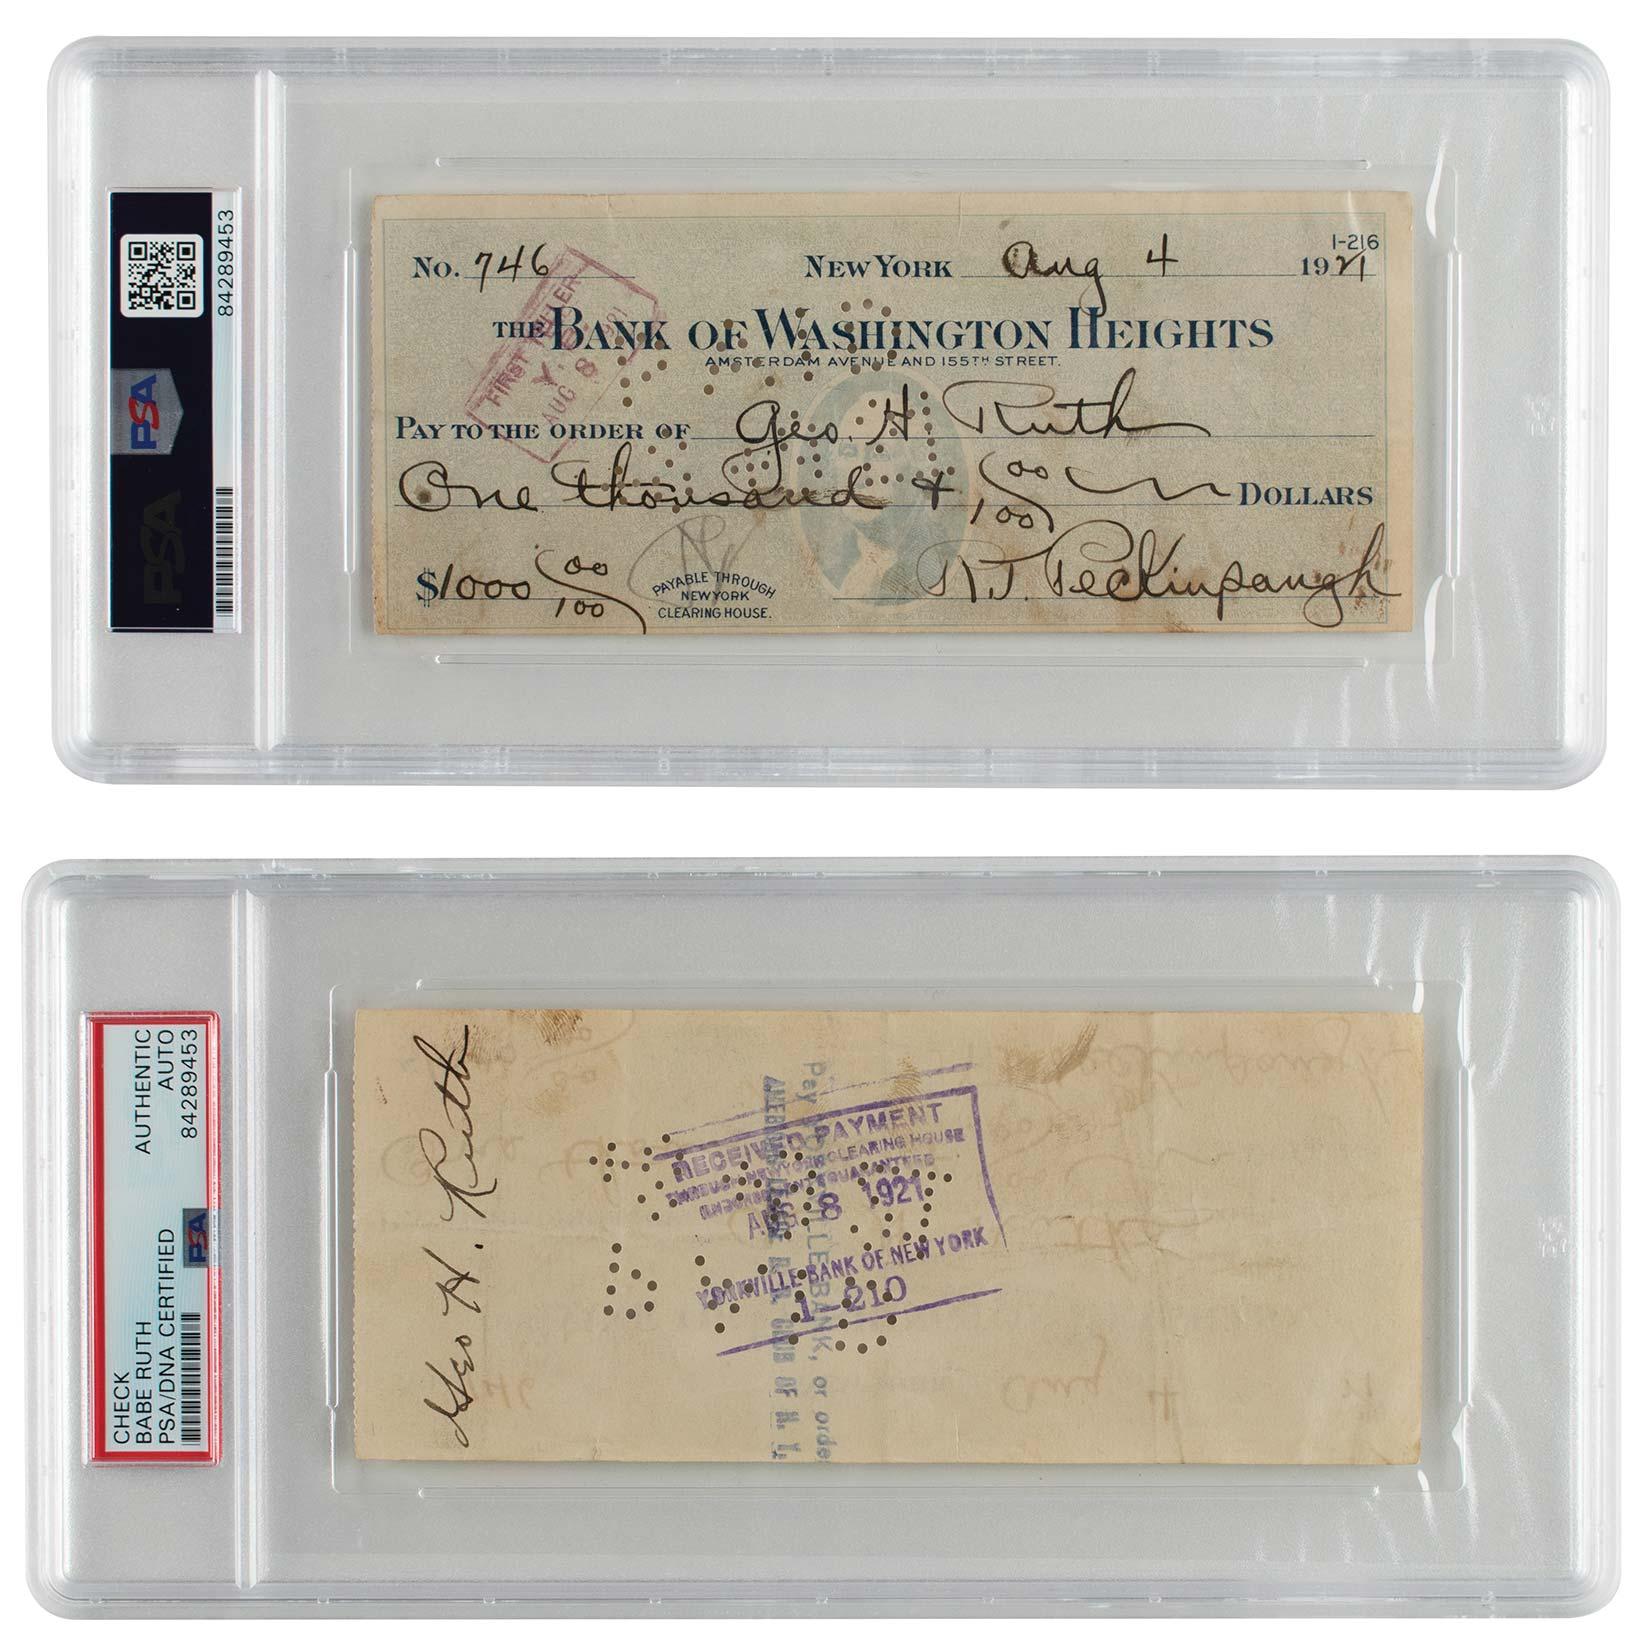 Bank of Washington Heights counter check by Roger Peckinpaugh, payable to Babe Ruth, $15,499.